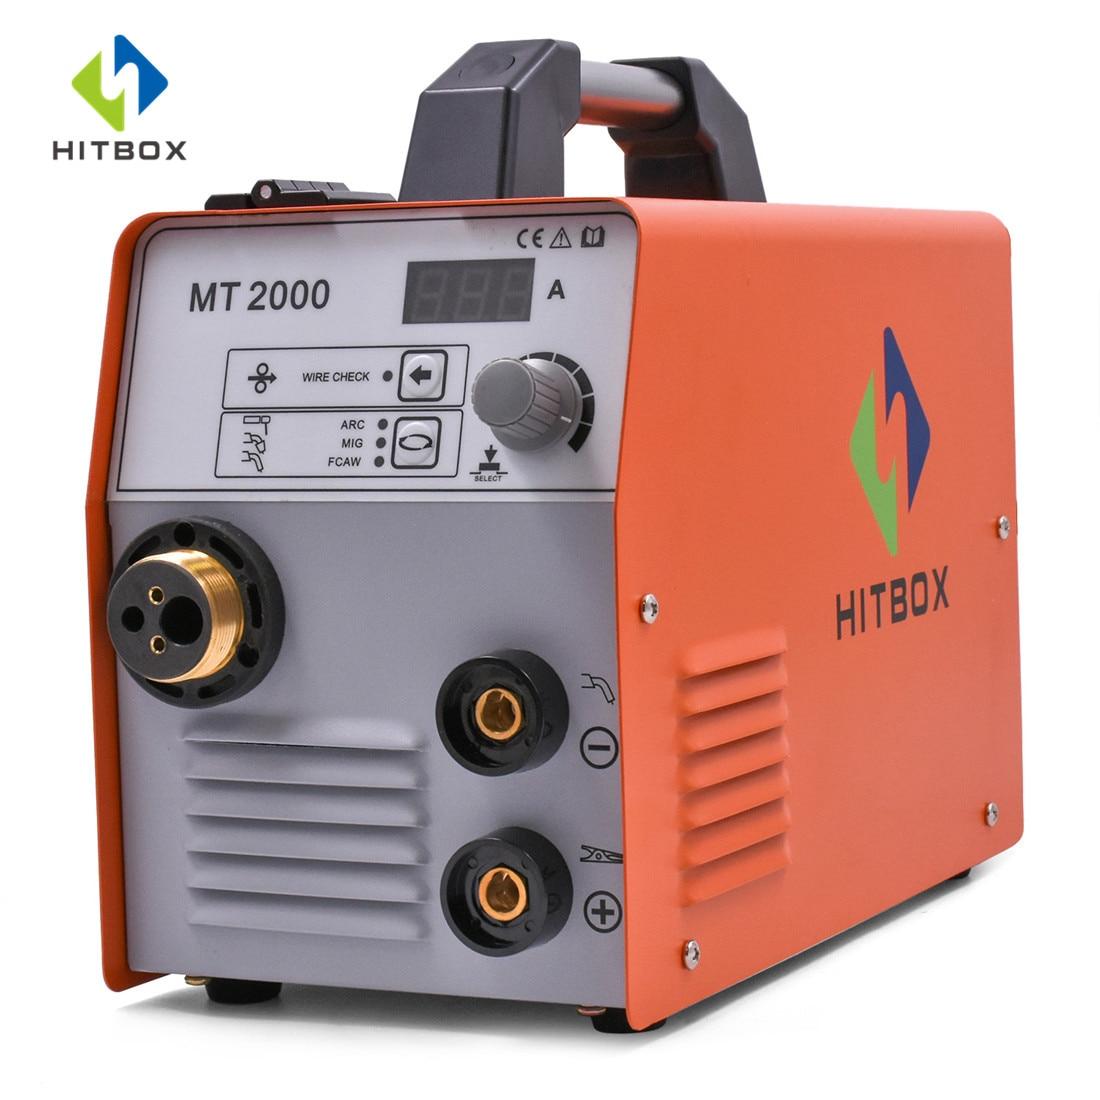 HITBOX Mig Welder MIG ARC TIG 220V Stainless Steel Iron Welding Machine MT2000 Functional Gas Gasless